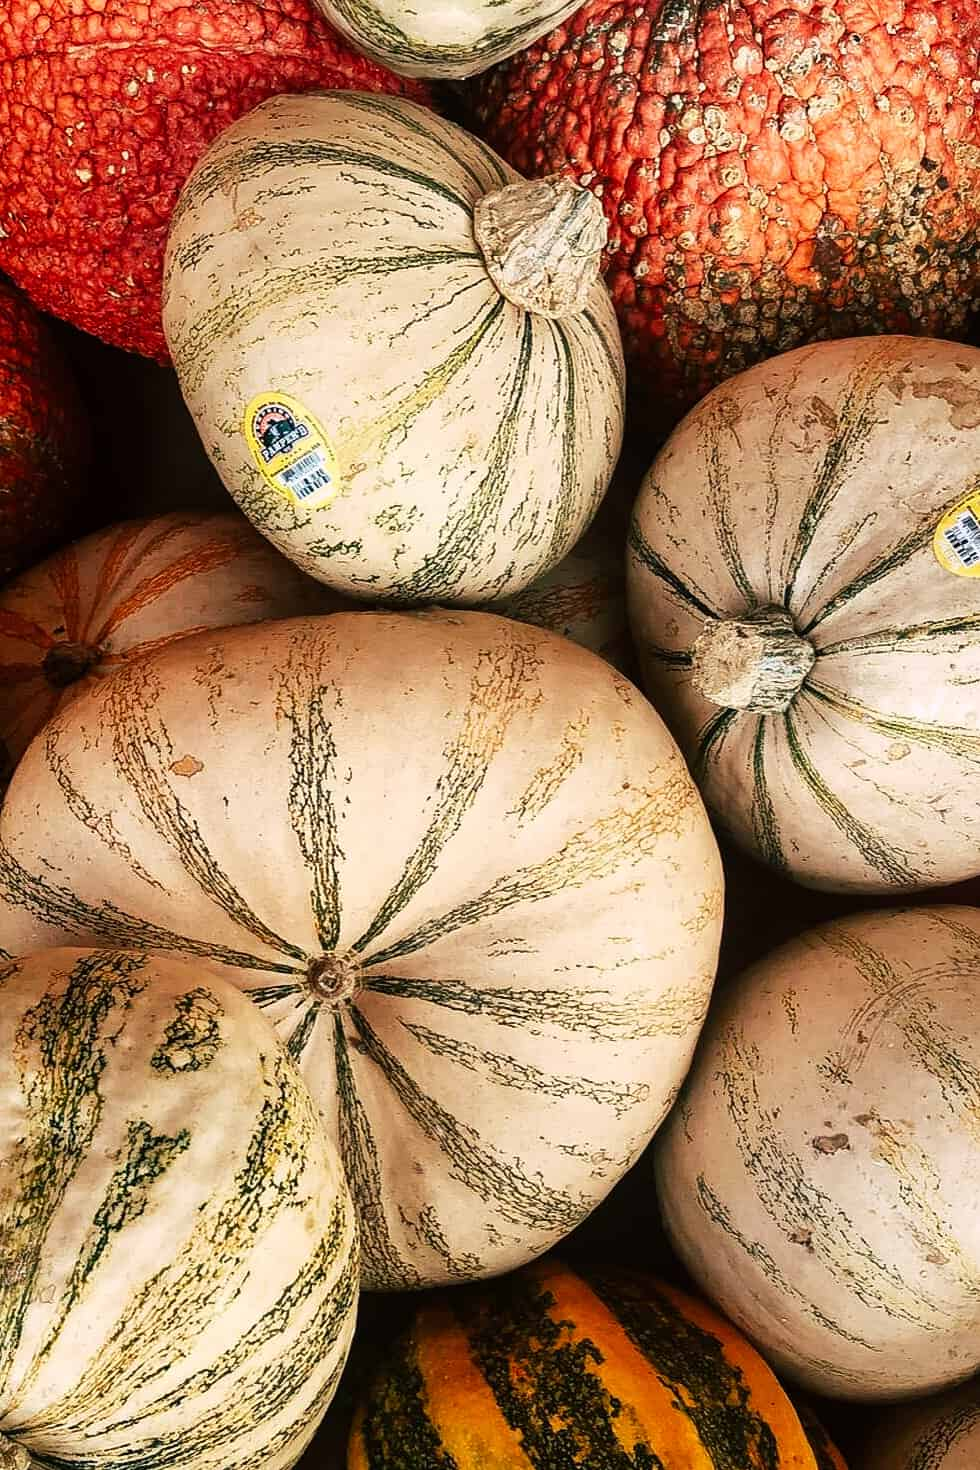 Orange, white, and green striped pumpkins.